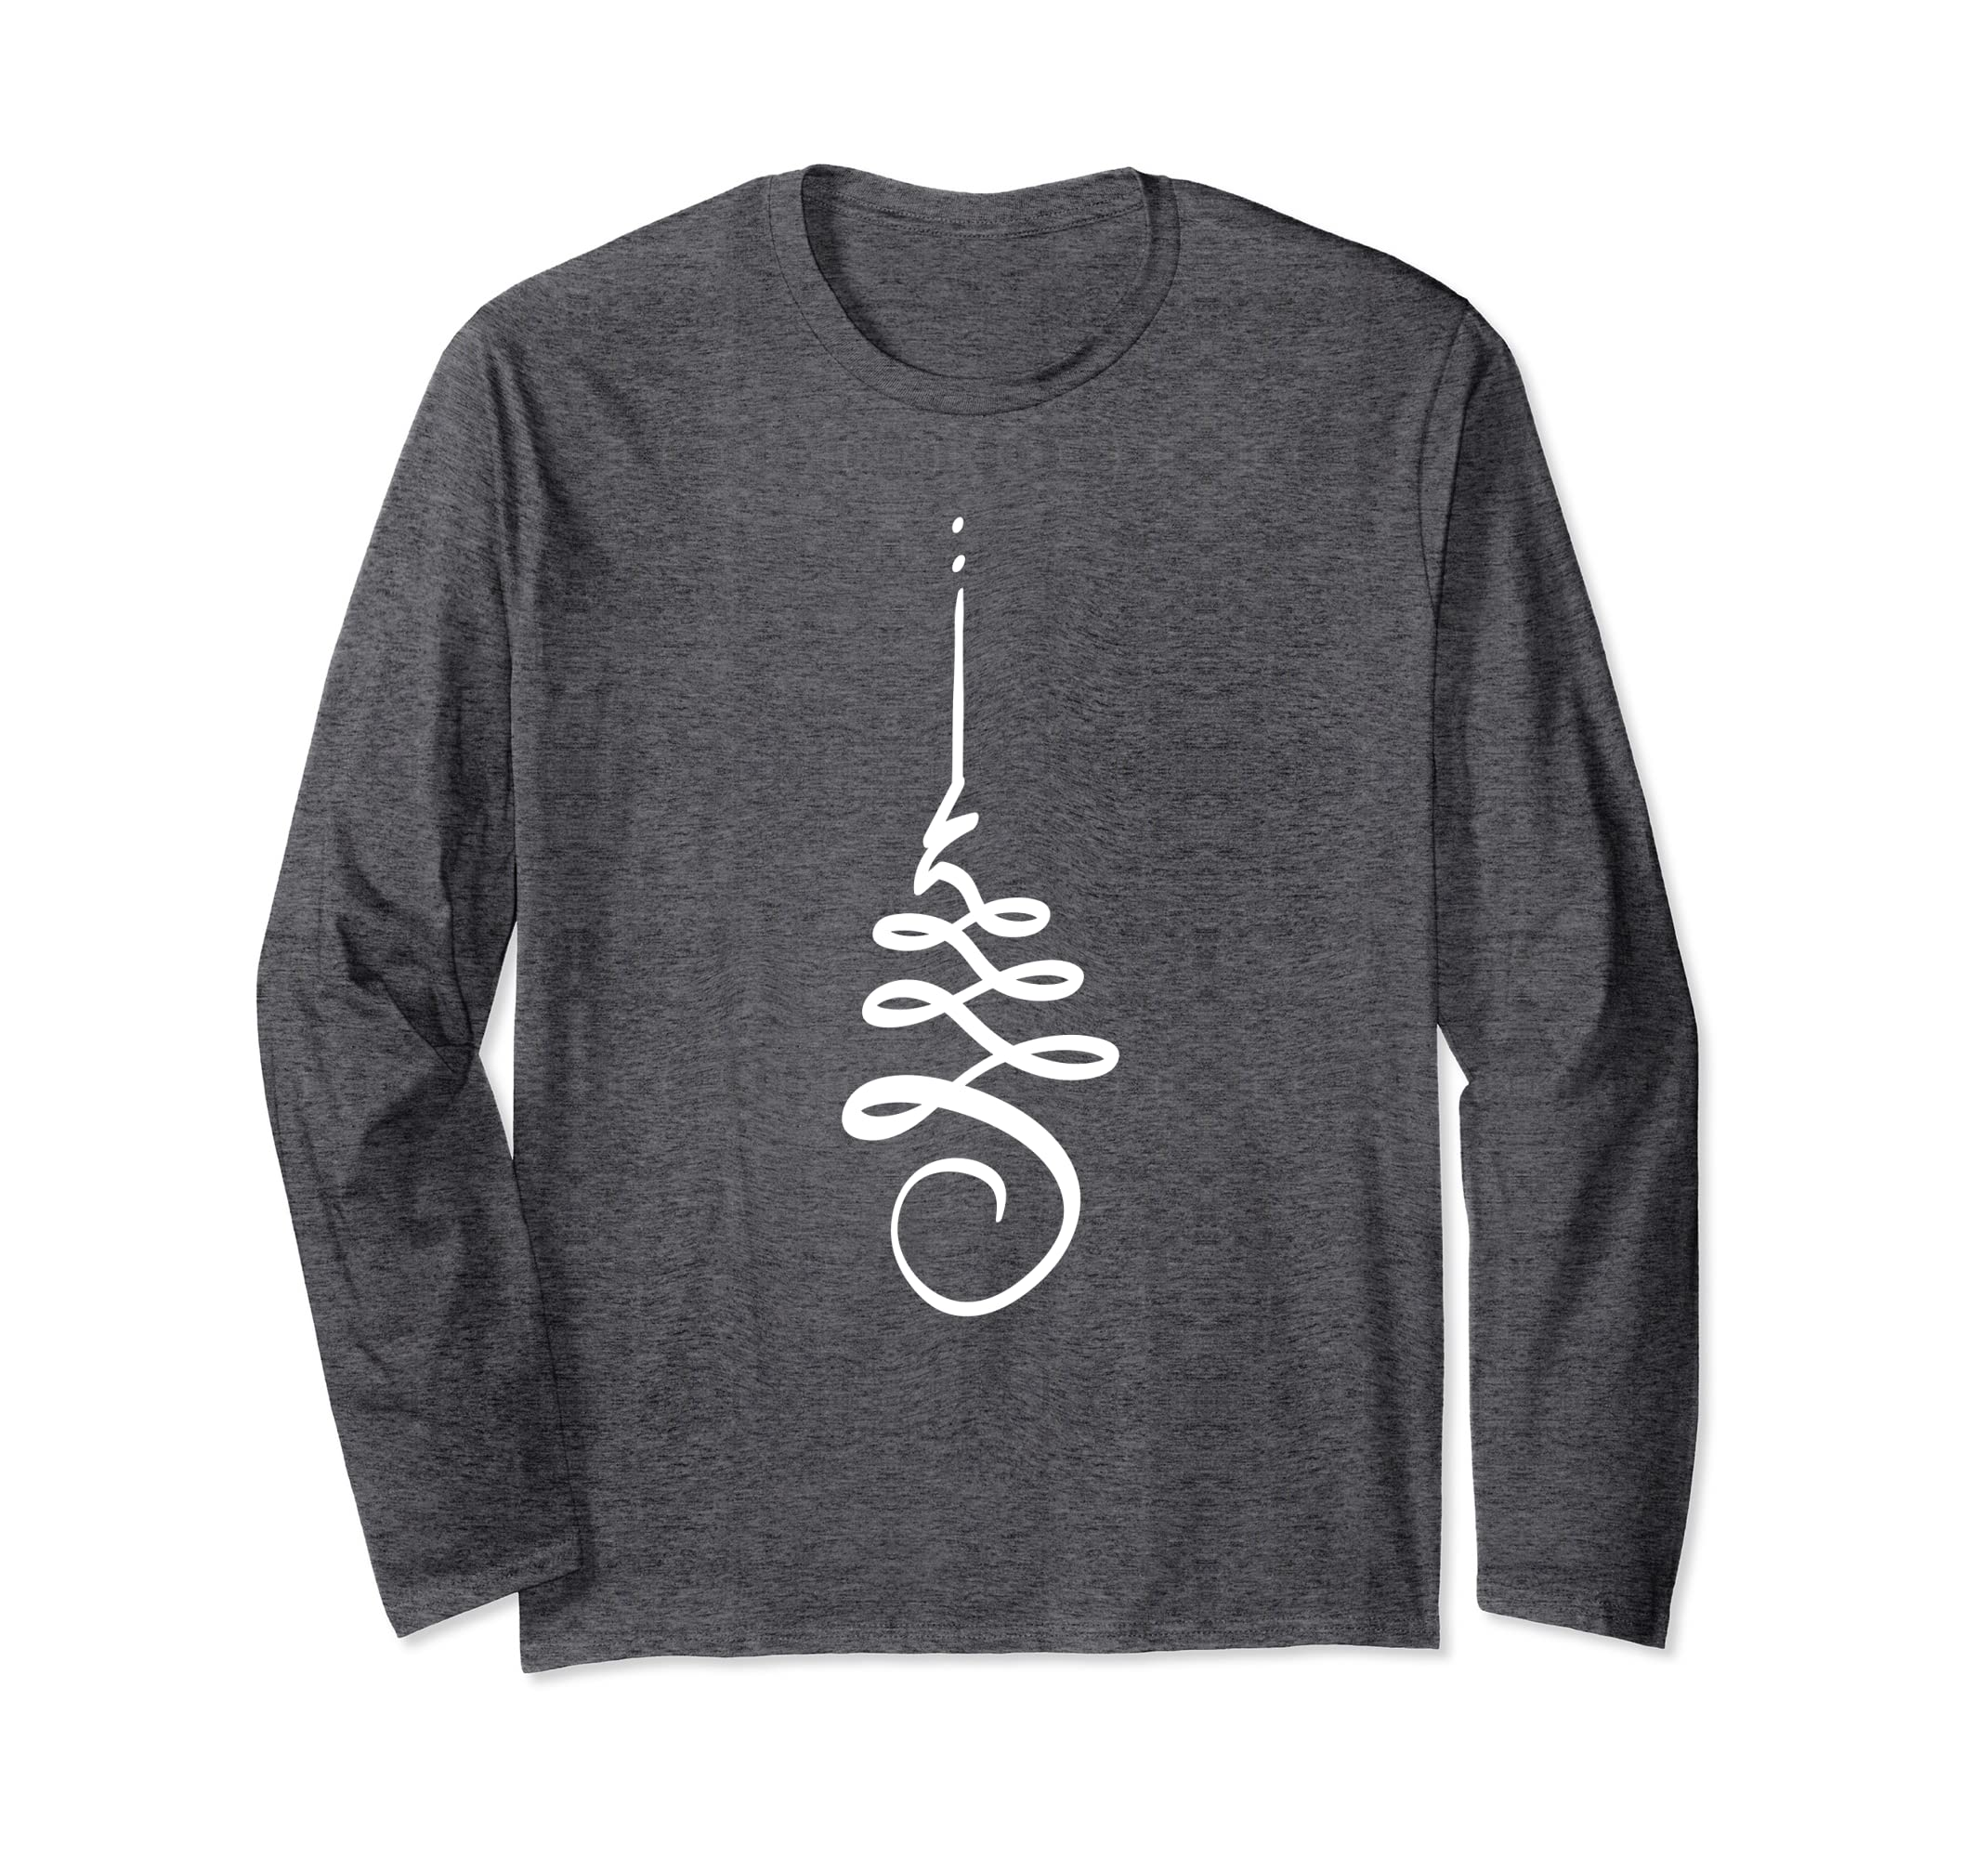 Unalome Lotus Meditation Boho Spiral Long Sleeve Shirt-Veotee